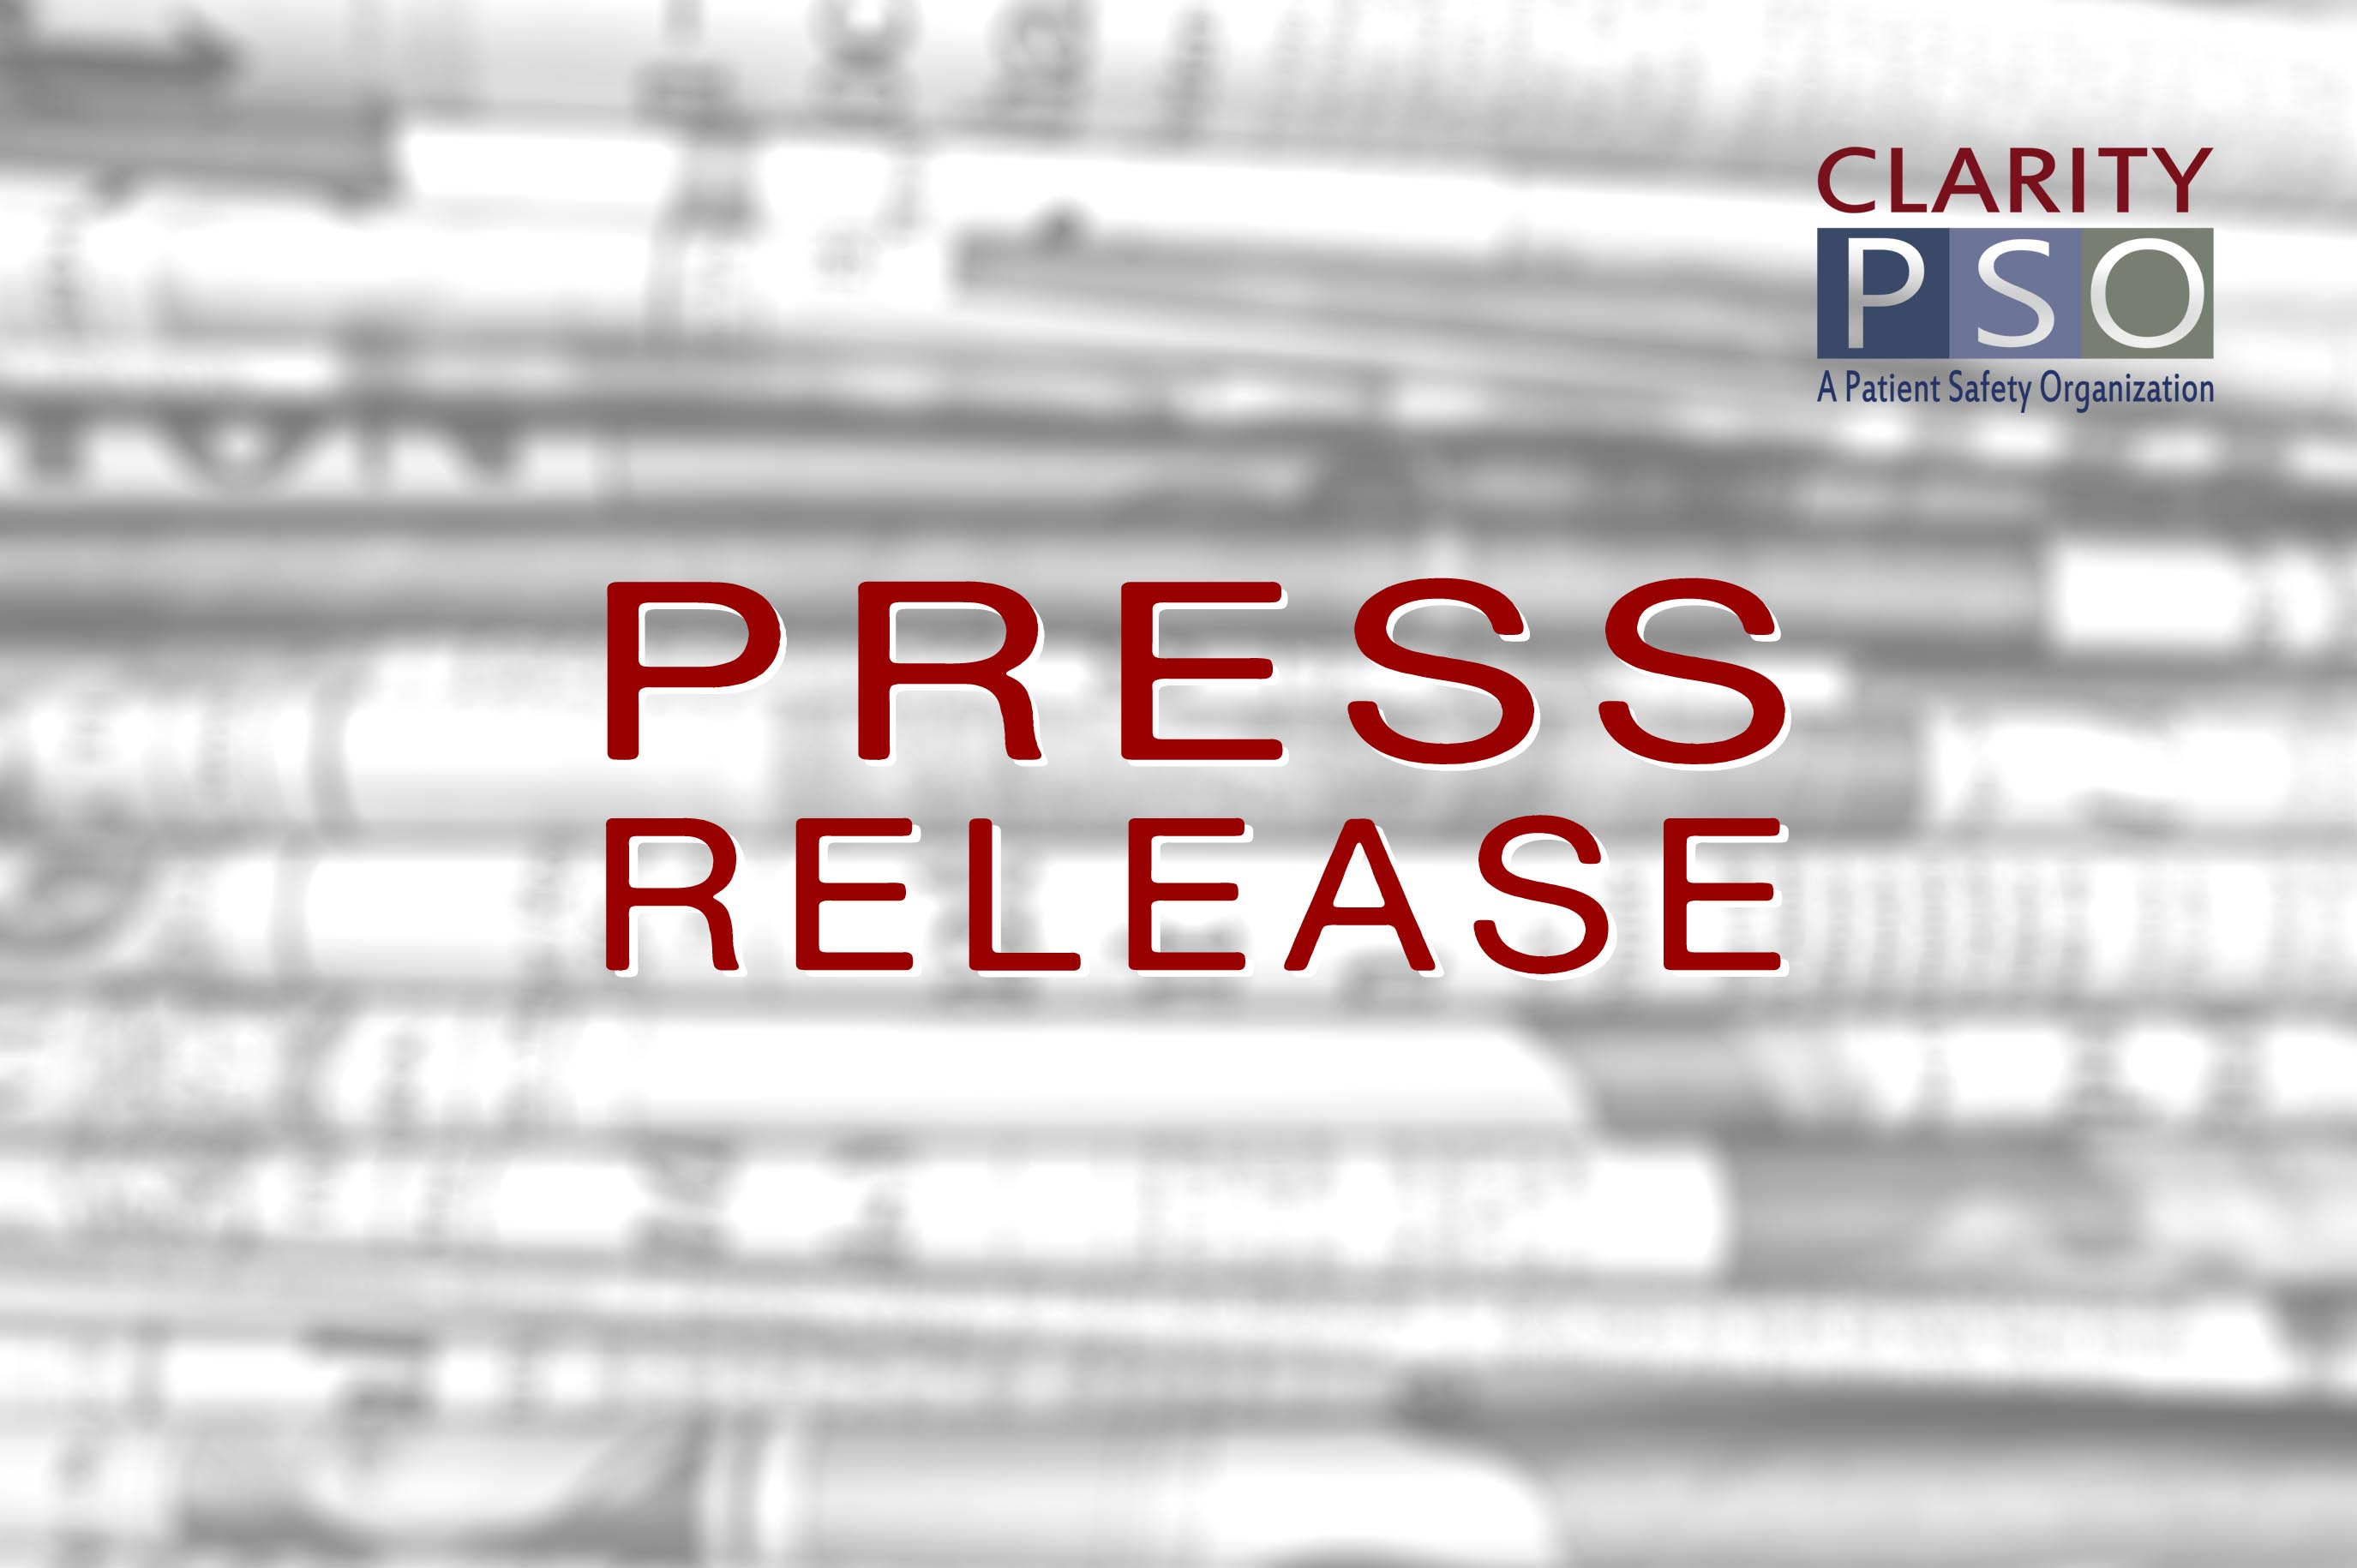 Clarity PSO Press Release